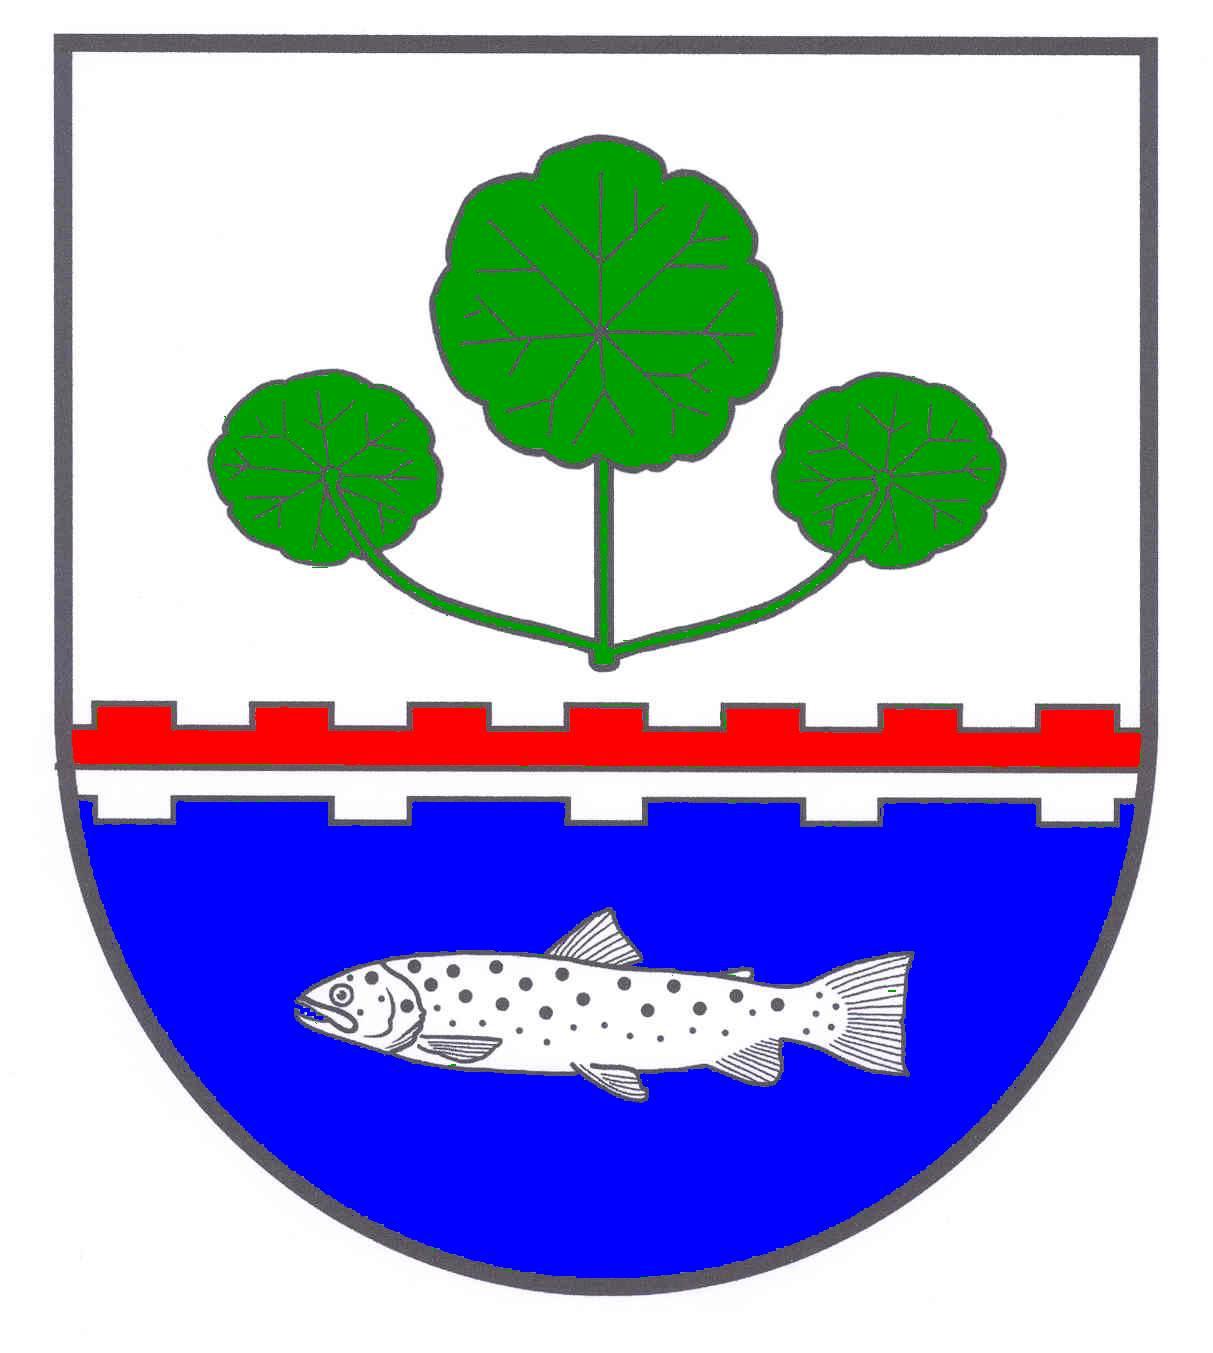 Wappen GemeindeHitzhusen, Kreis Segeberg